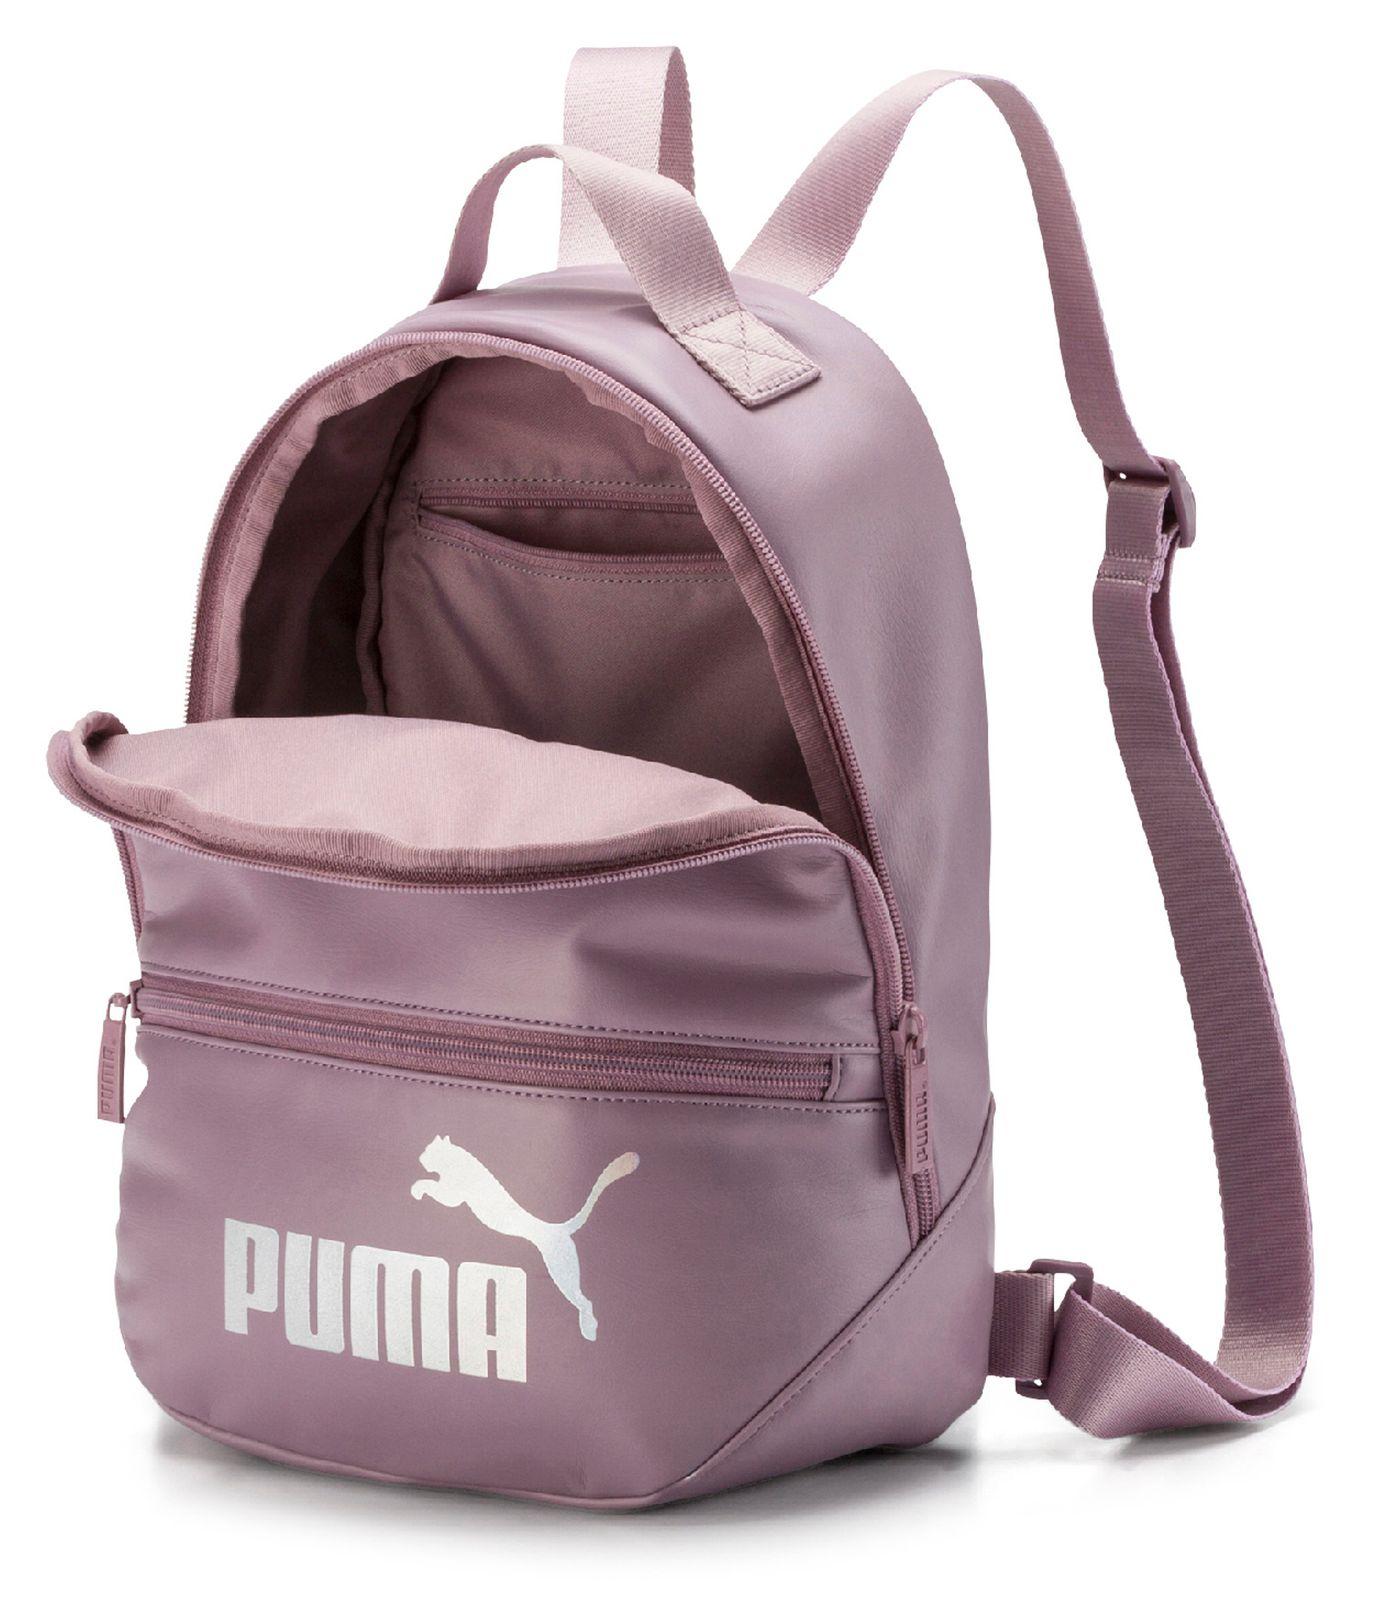 Puma Damen Rucksack Core Up Archive silber | Damenrucksäcke